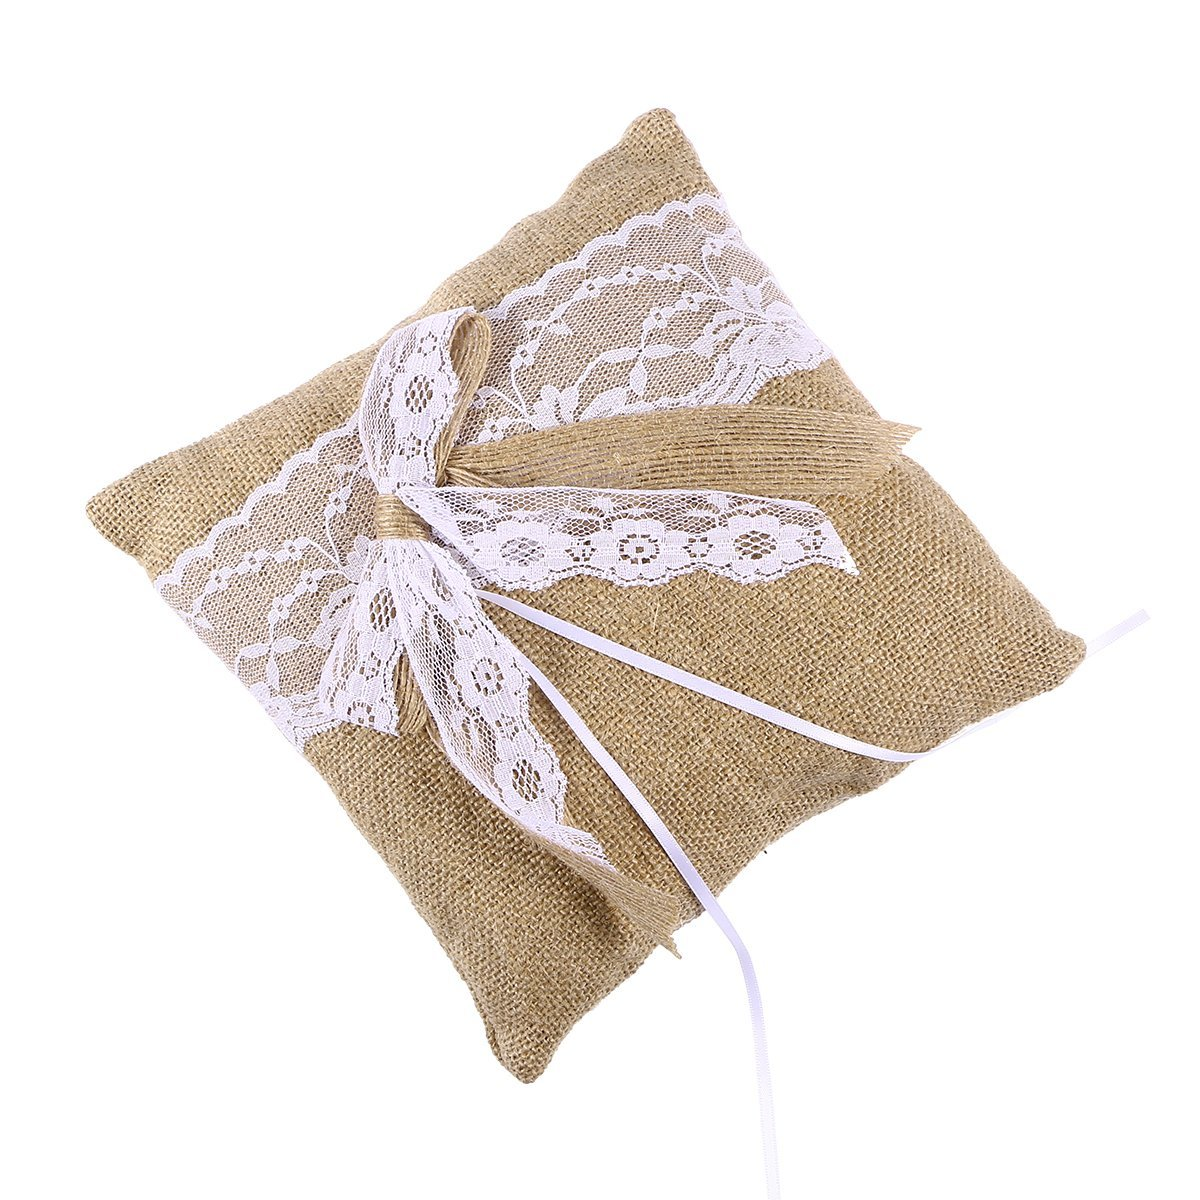 WINOMO Burlap Wedding Ring Pillow Bearer Cushion 20 x 20cm Brown